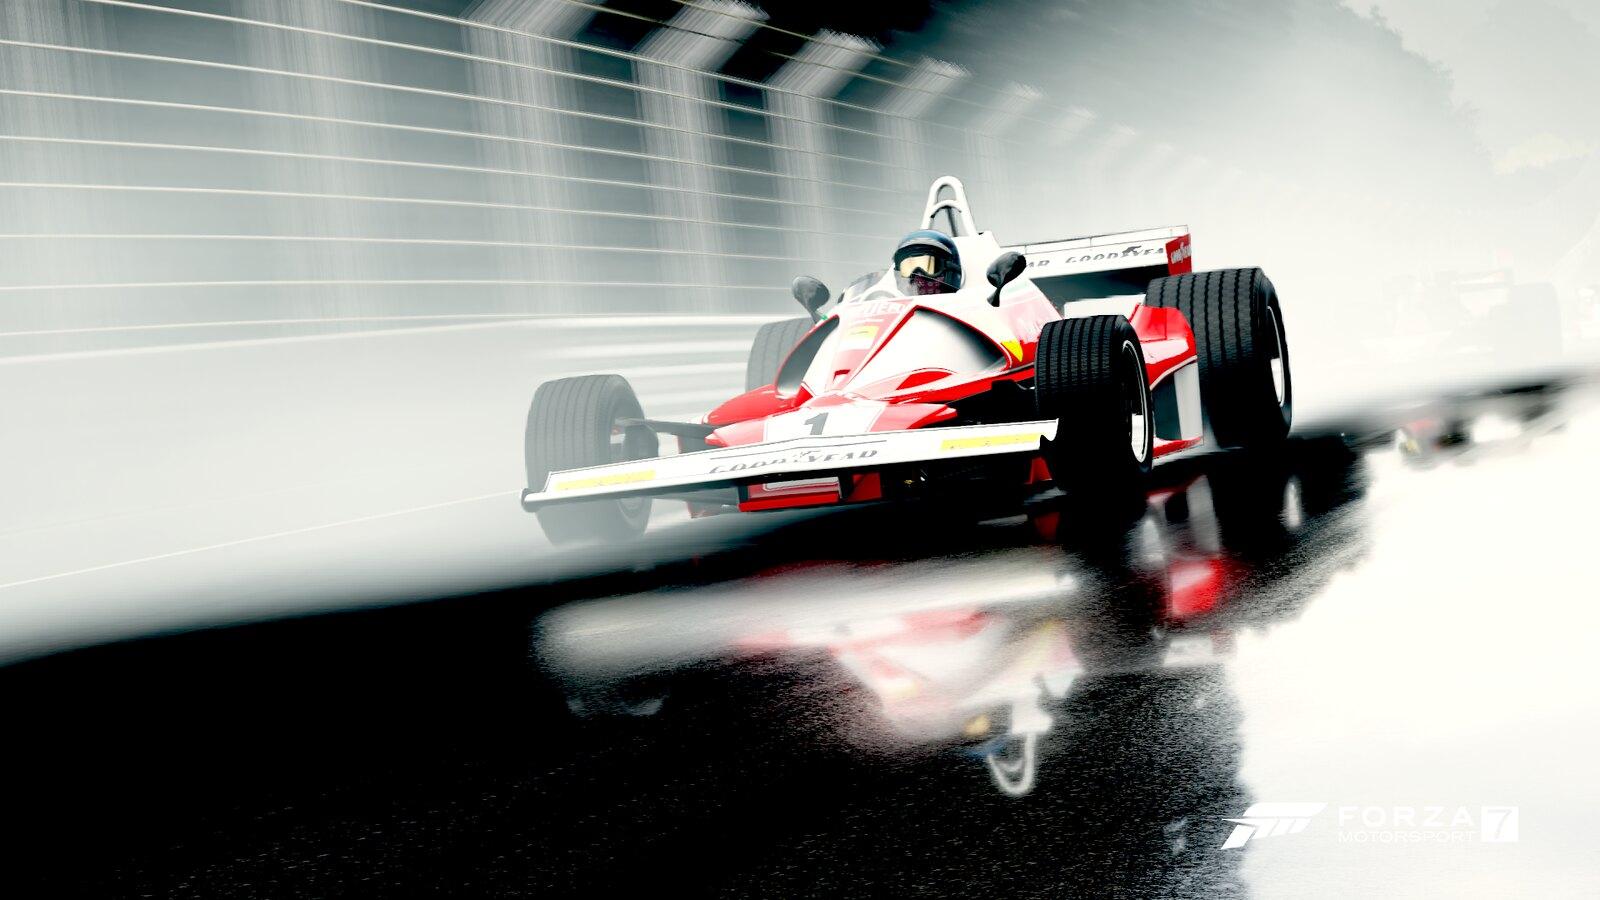 26712216759_533741d3d6_h ForzaMotorsport.fr